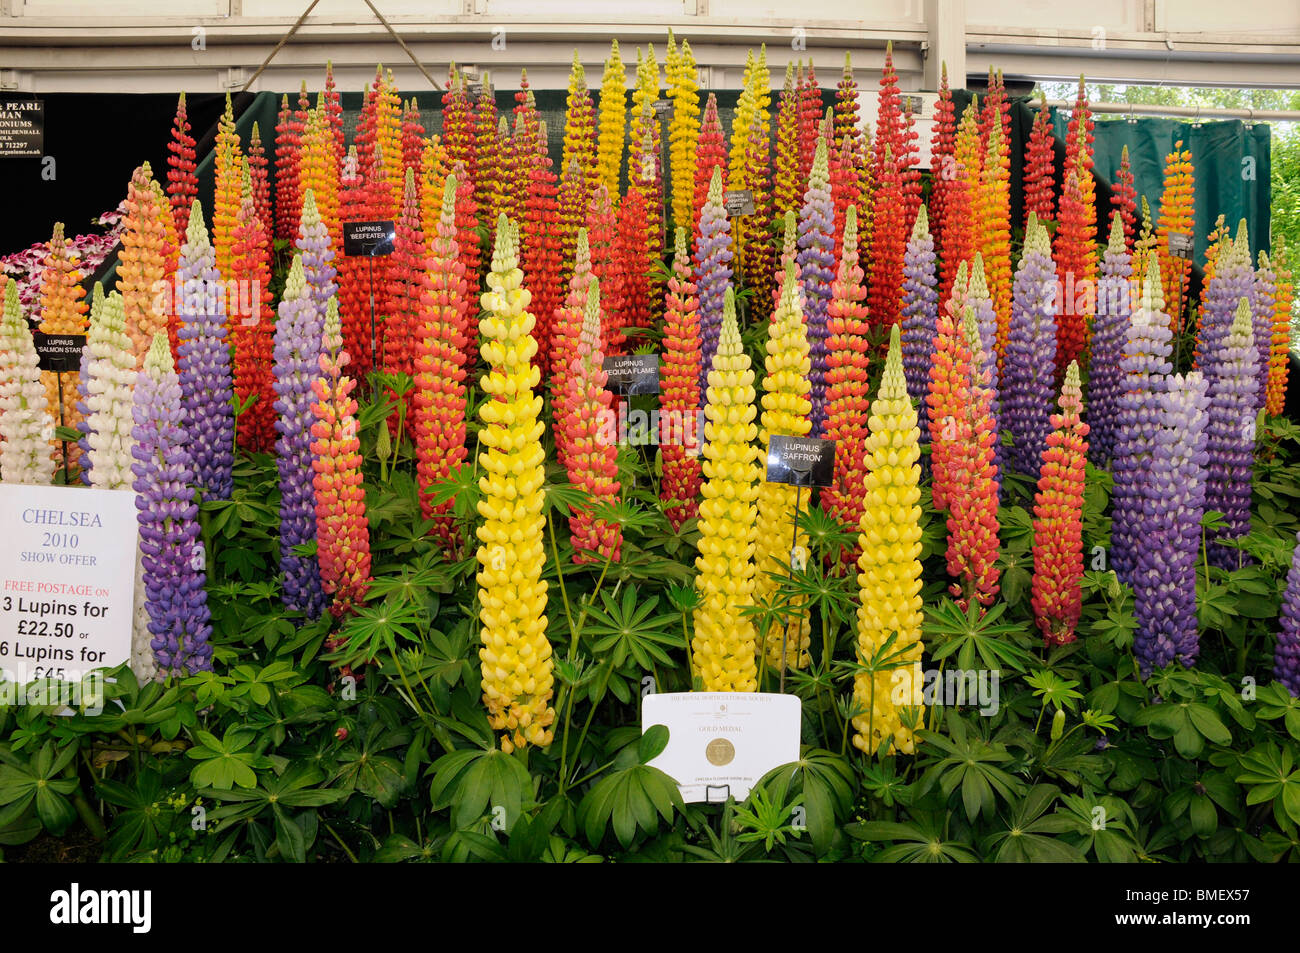 Annual Chelsea Flower Show - the award winning Lupin grower, Westcountry Nurseries. 2010. Stock Photo